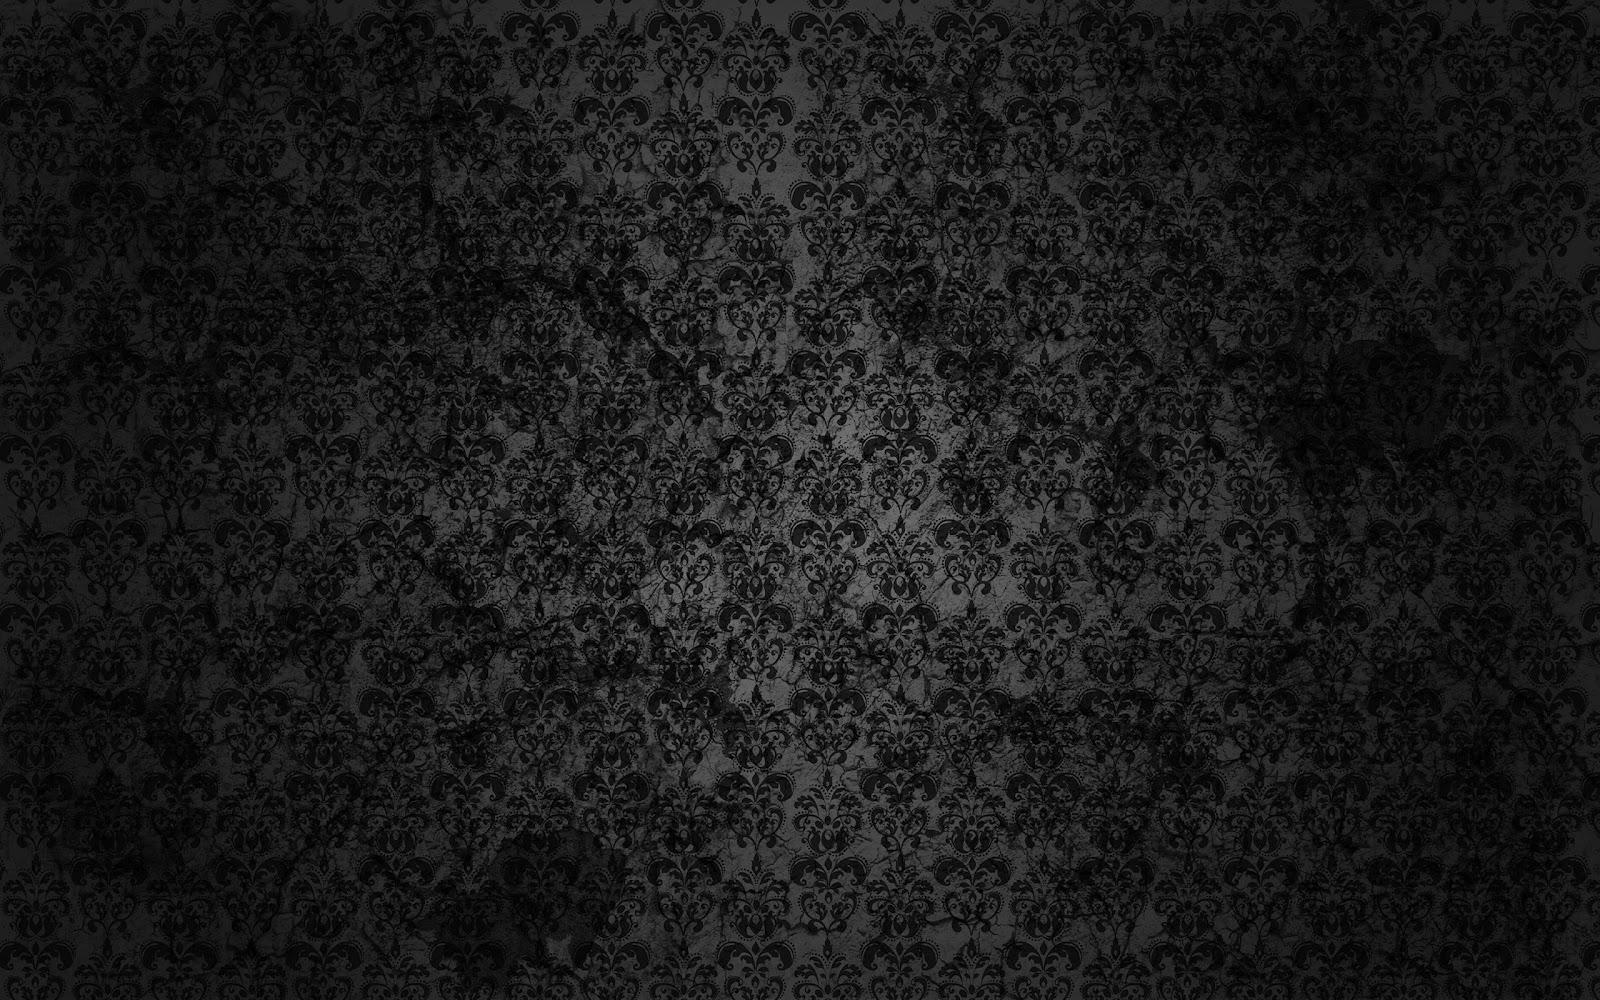 Black Floral Grunge   Full HD Desktop Wallpapers 1080p